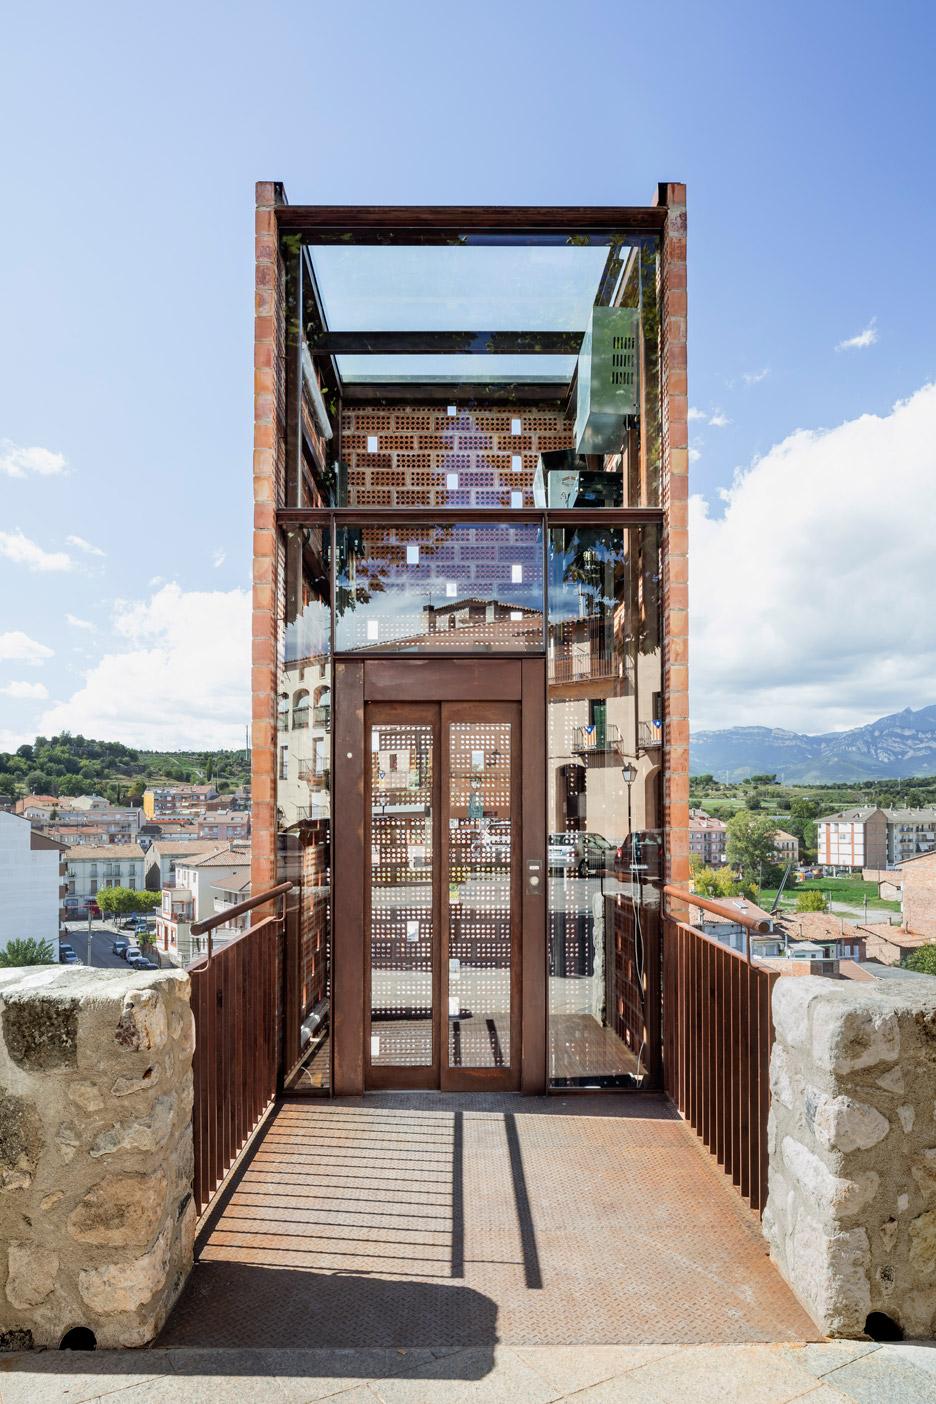 New-Access-to-Gironellas-Historic-Center_Barcelona-Spain_Carles-Enrich_dezeen_936_2.jpg